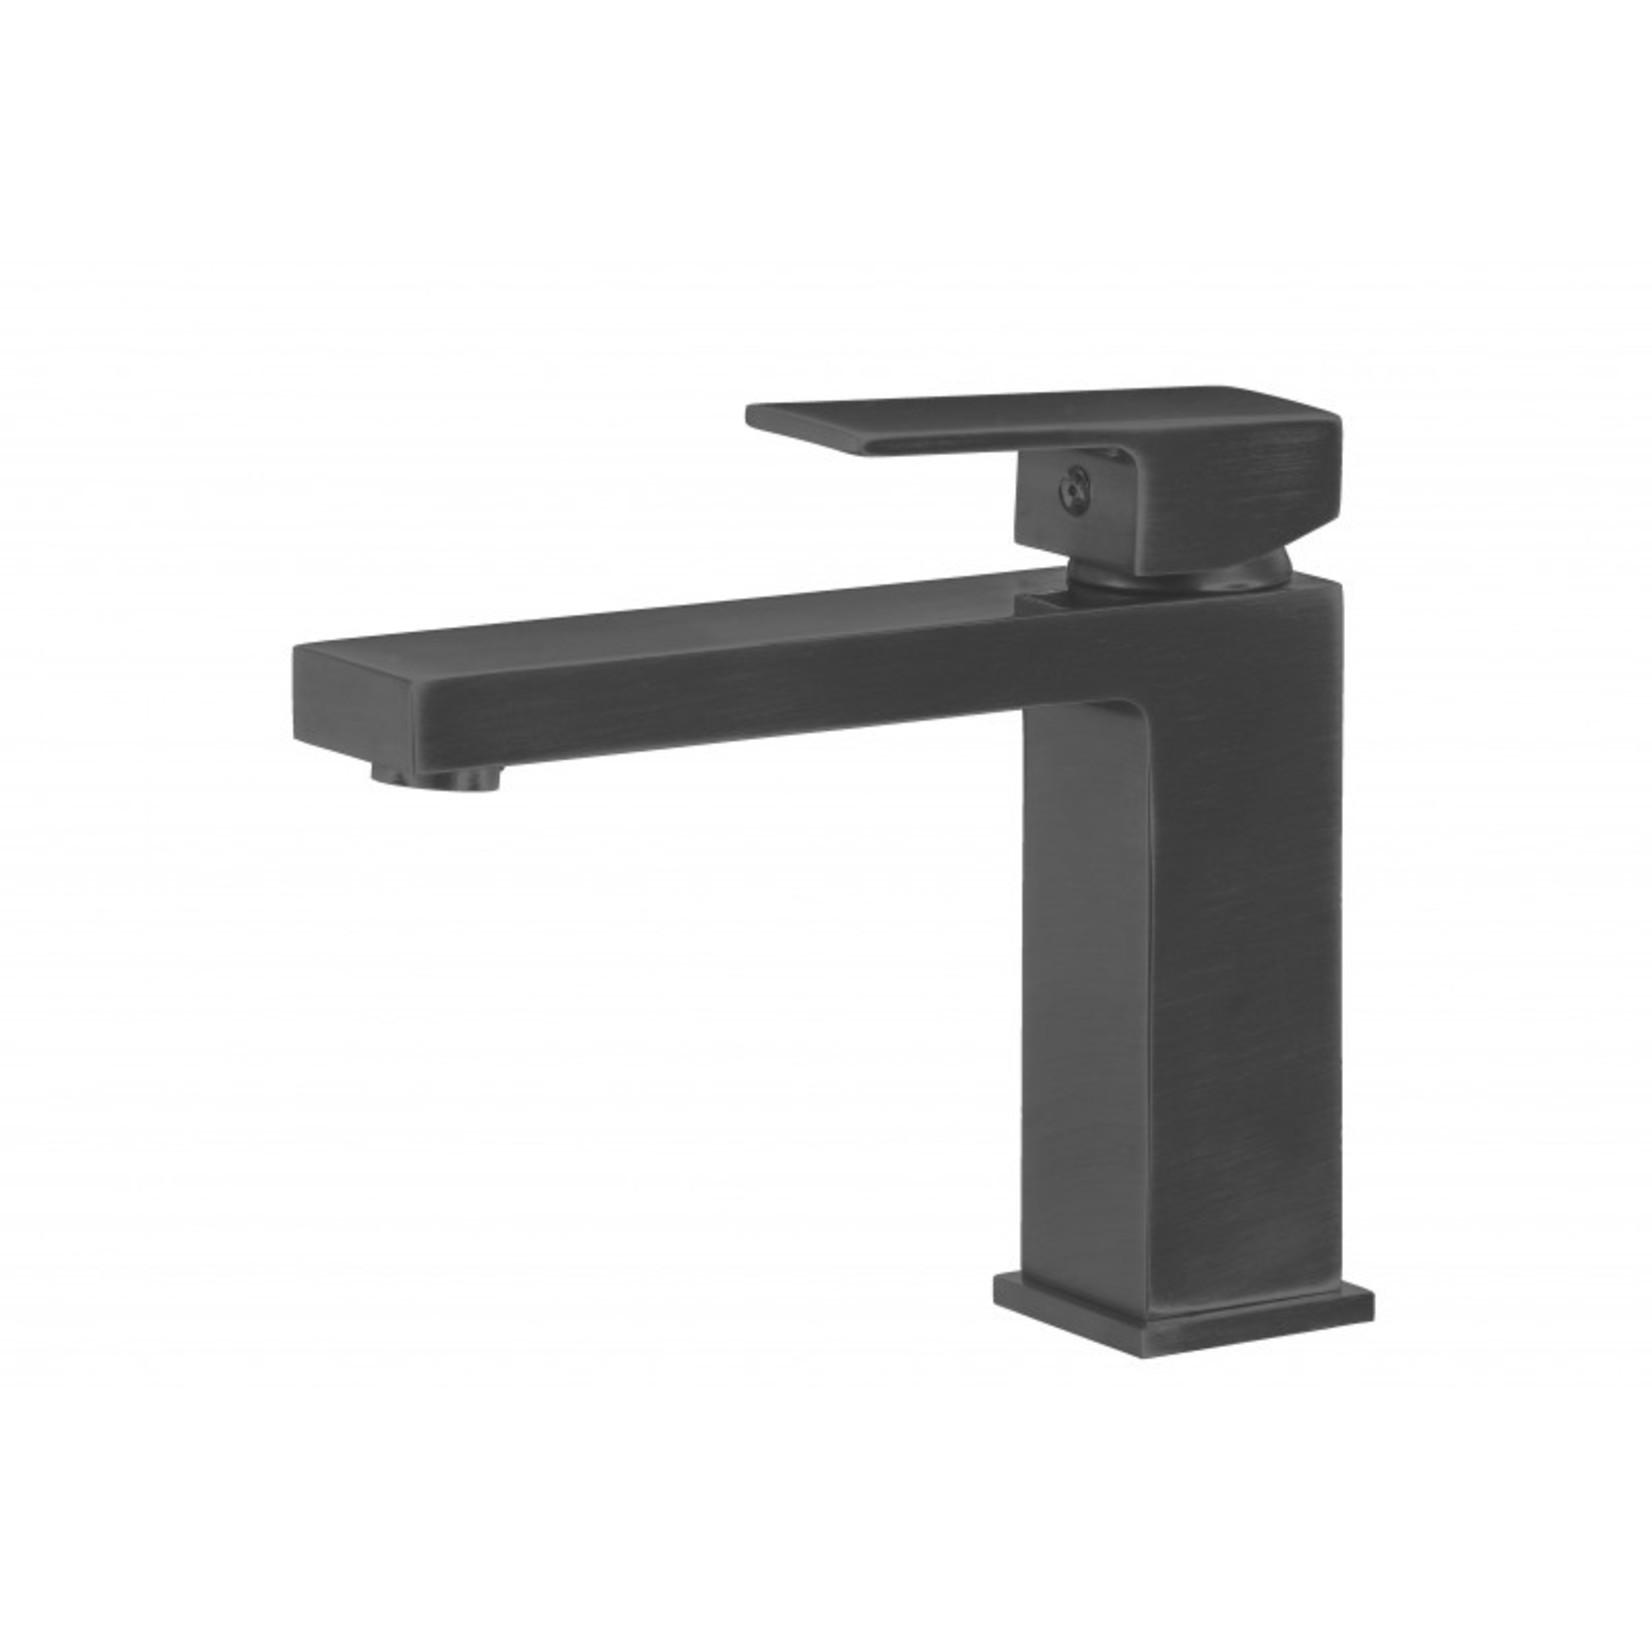 Matte black washbasin faucet 145-MB